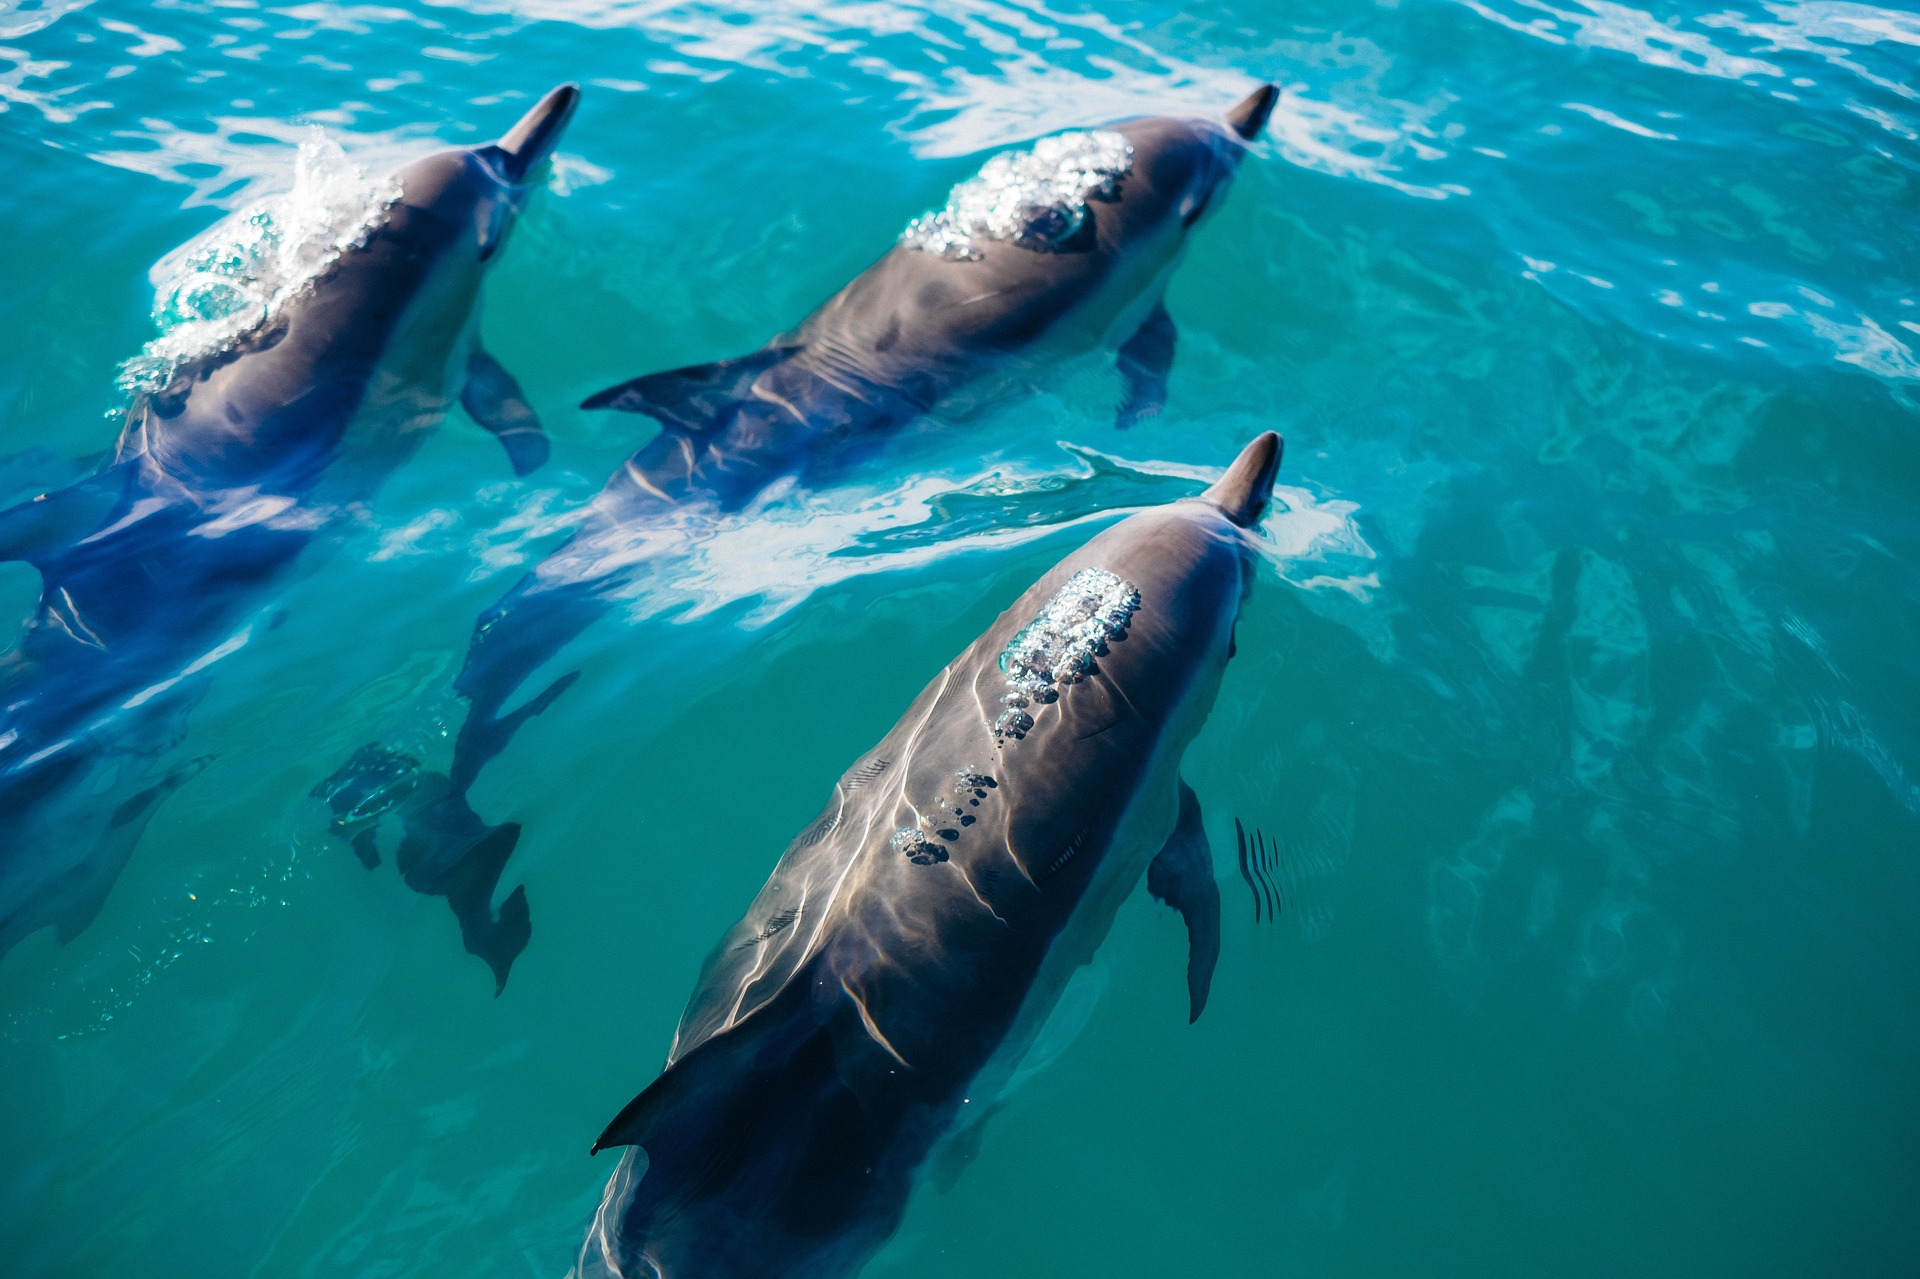 Marine mammals pictures - photo#30